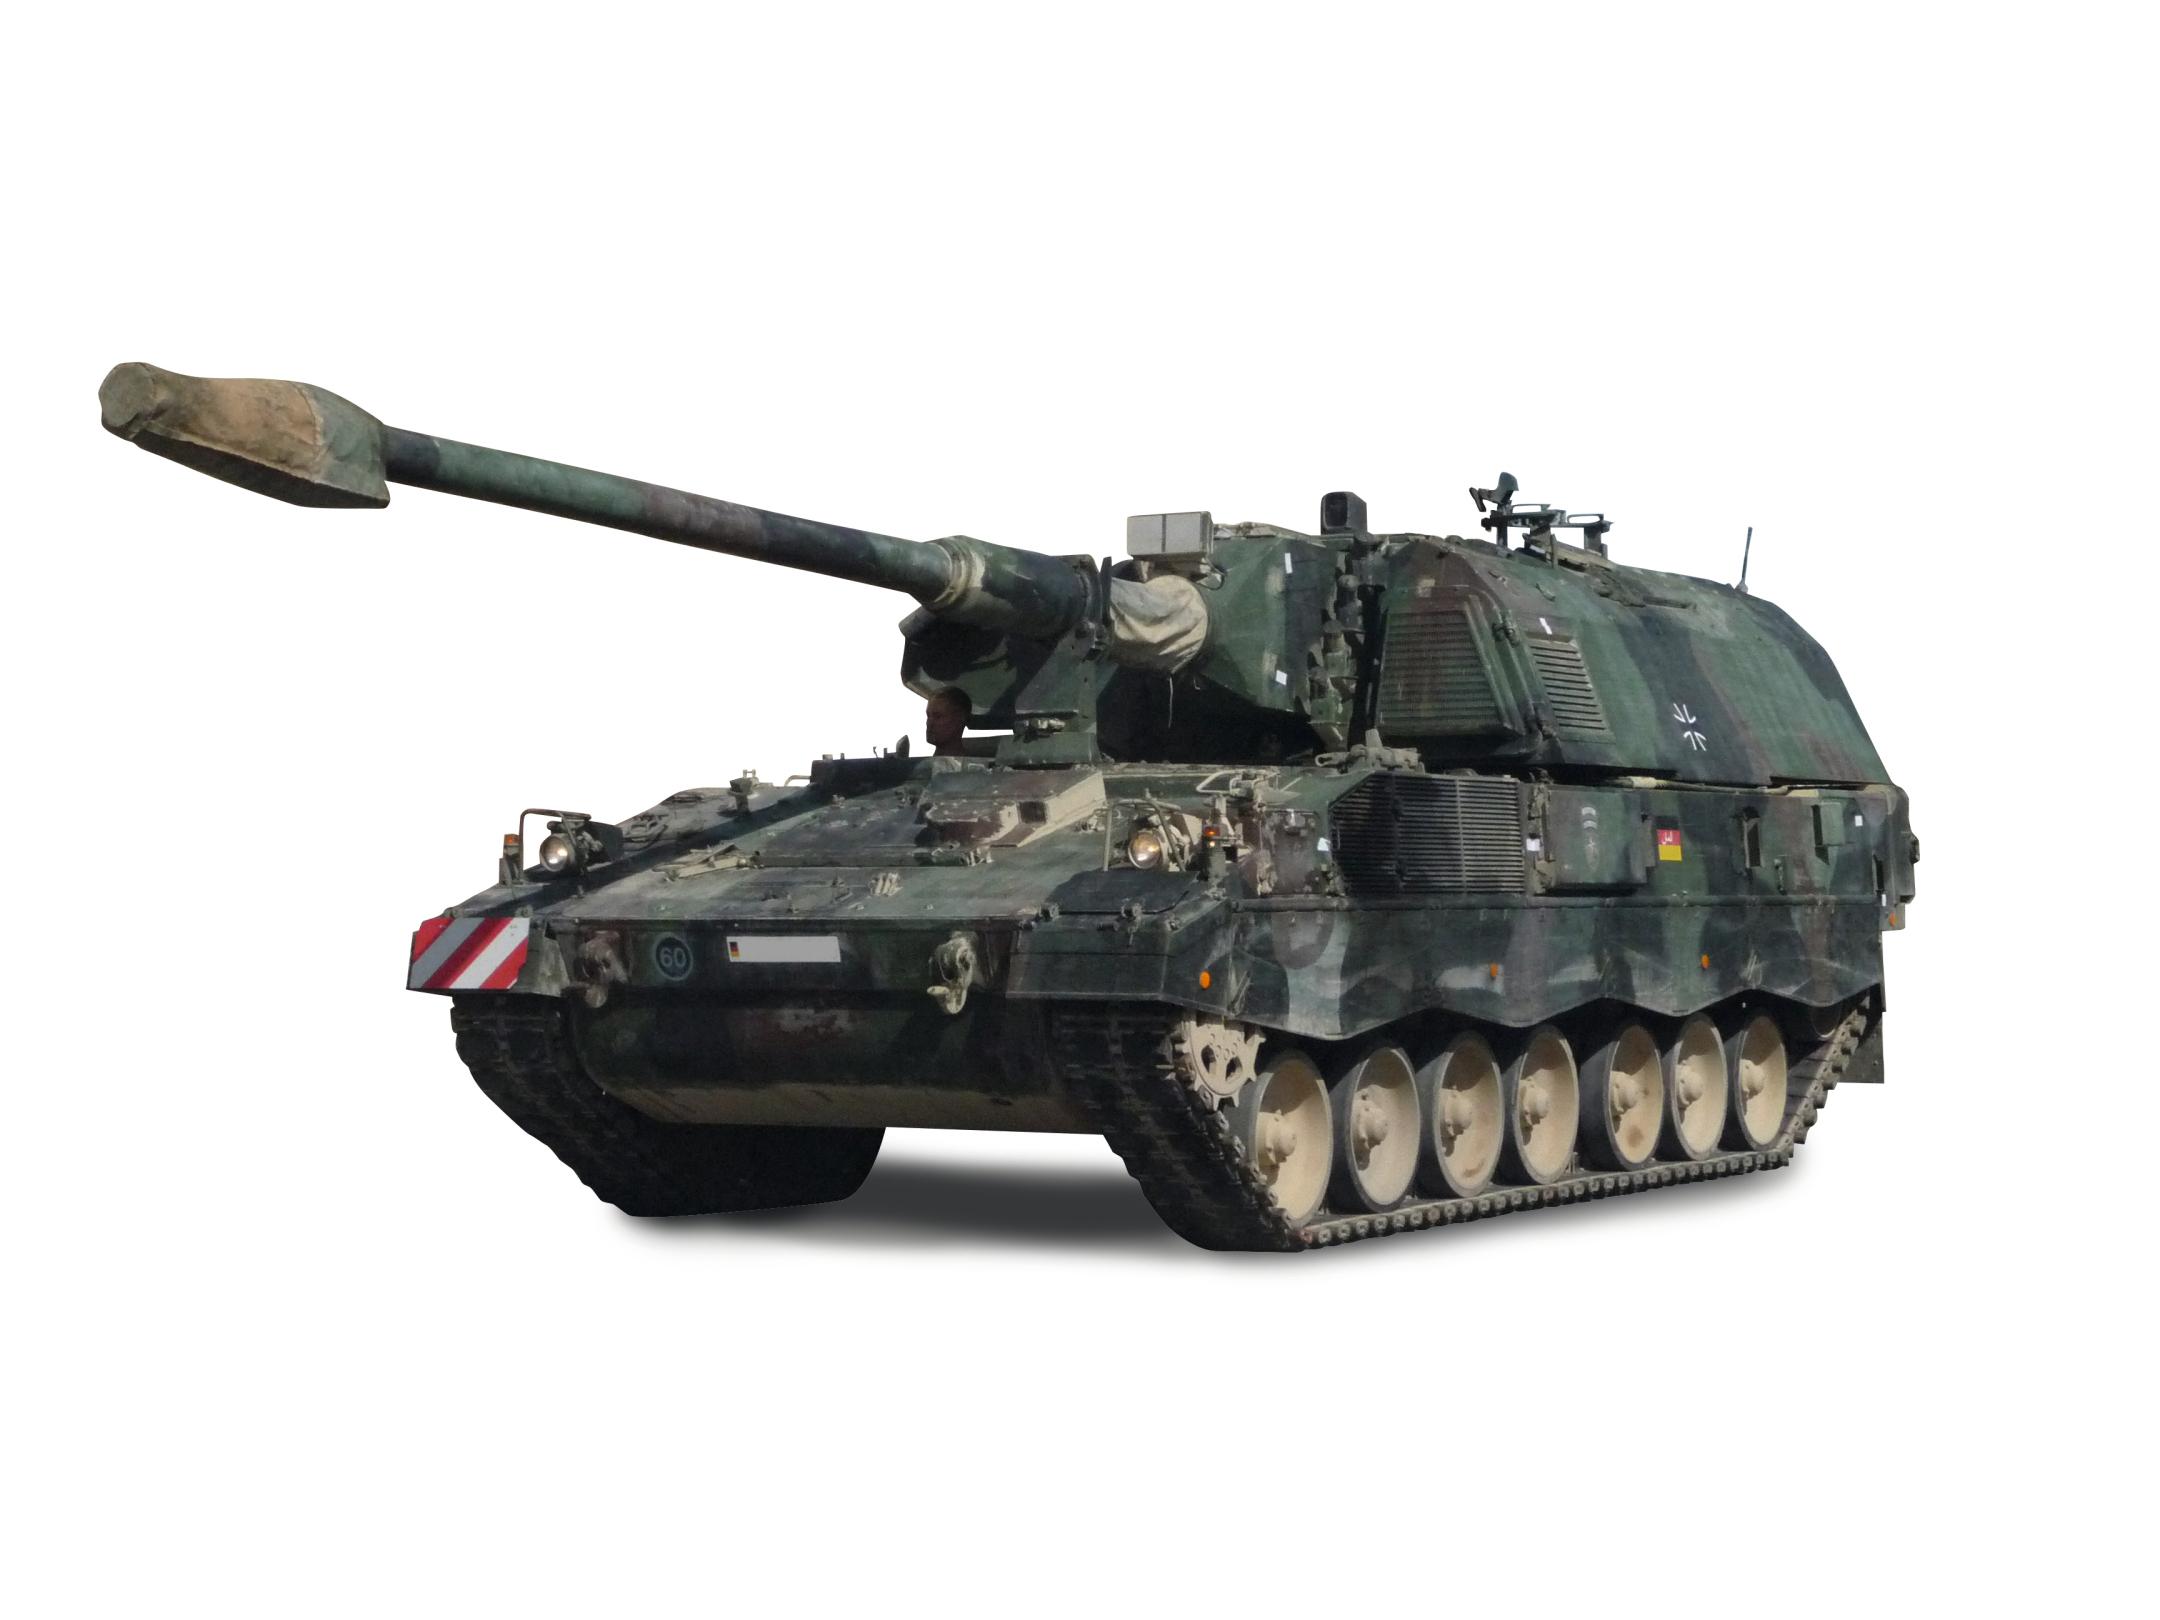 Panzerhaubitze 2000 - Bundeswehr